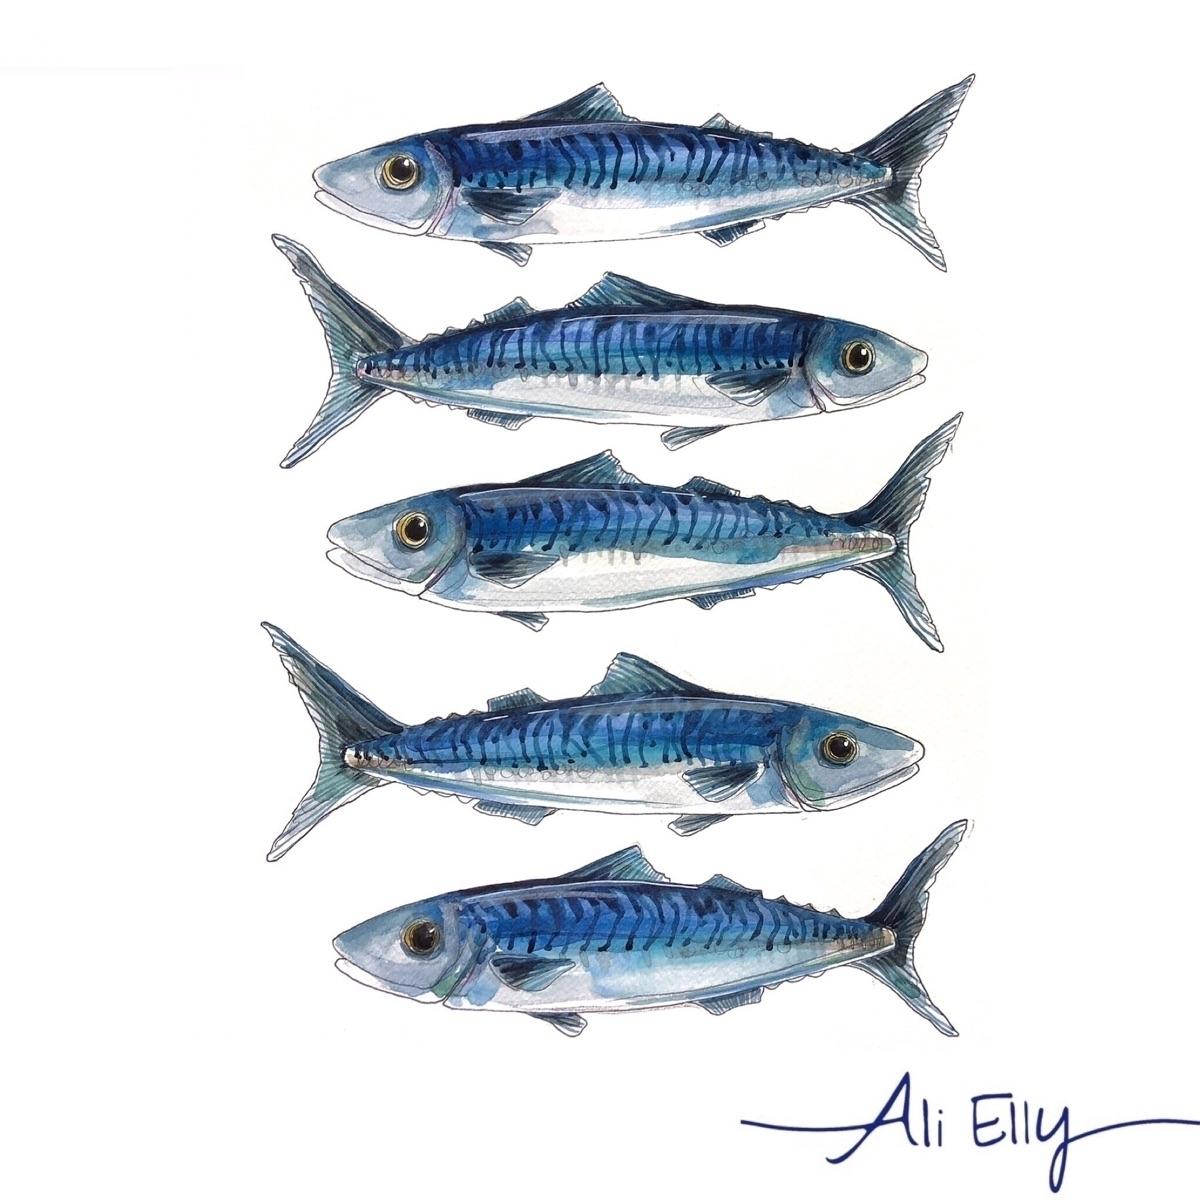 fish, design, blue, illustration - aliellydesign | ello